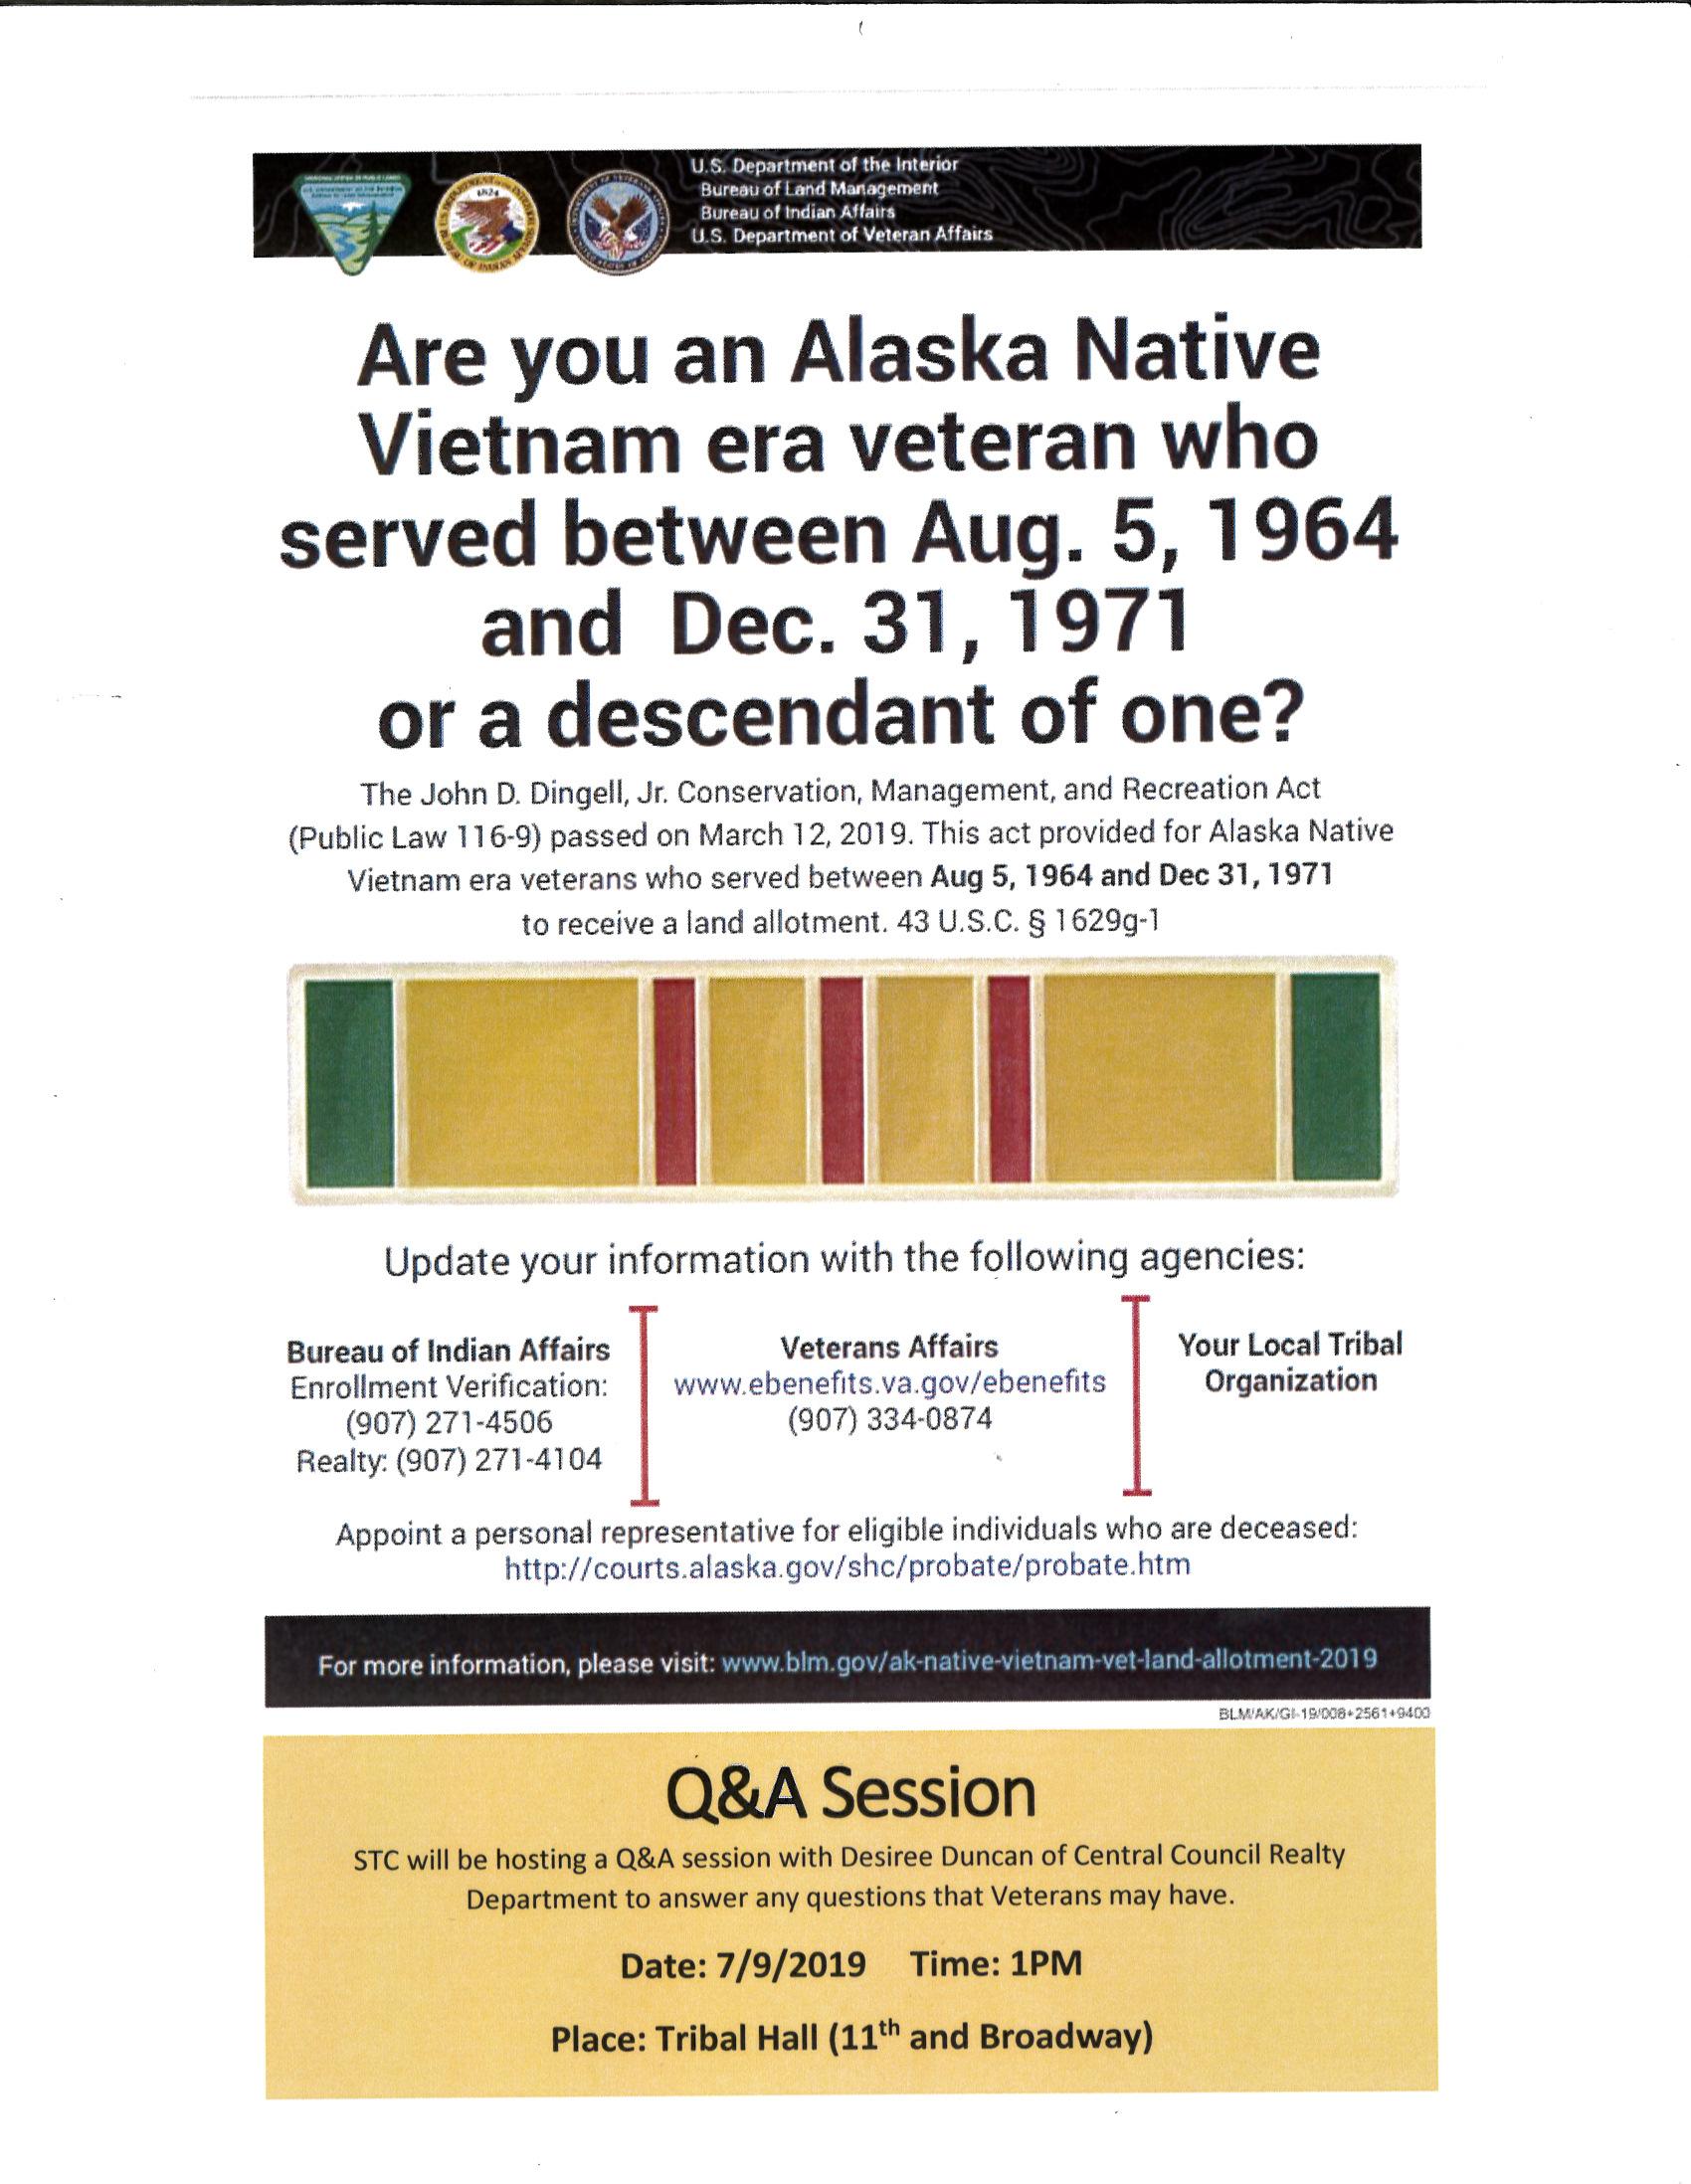 AK Native Vet Q&A session.jpg